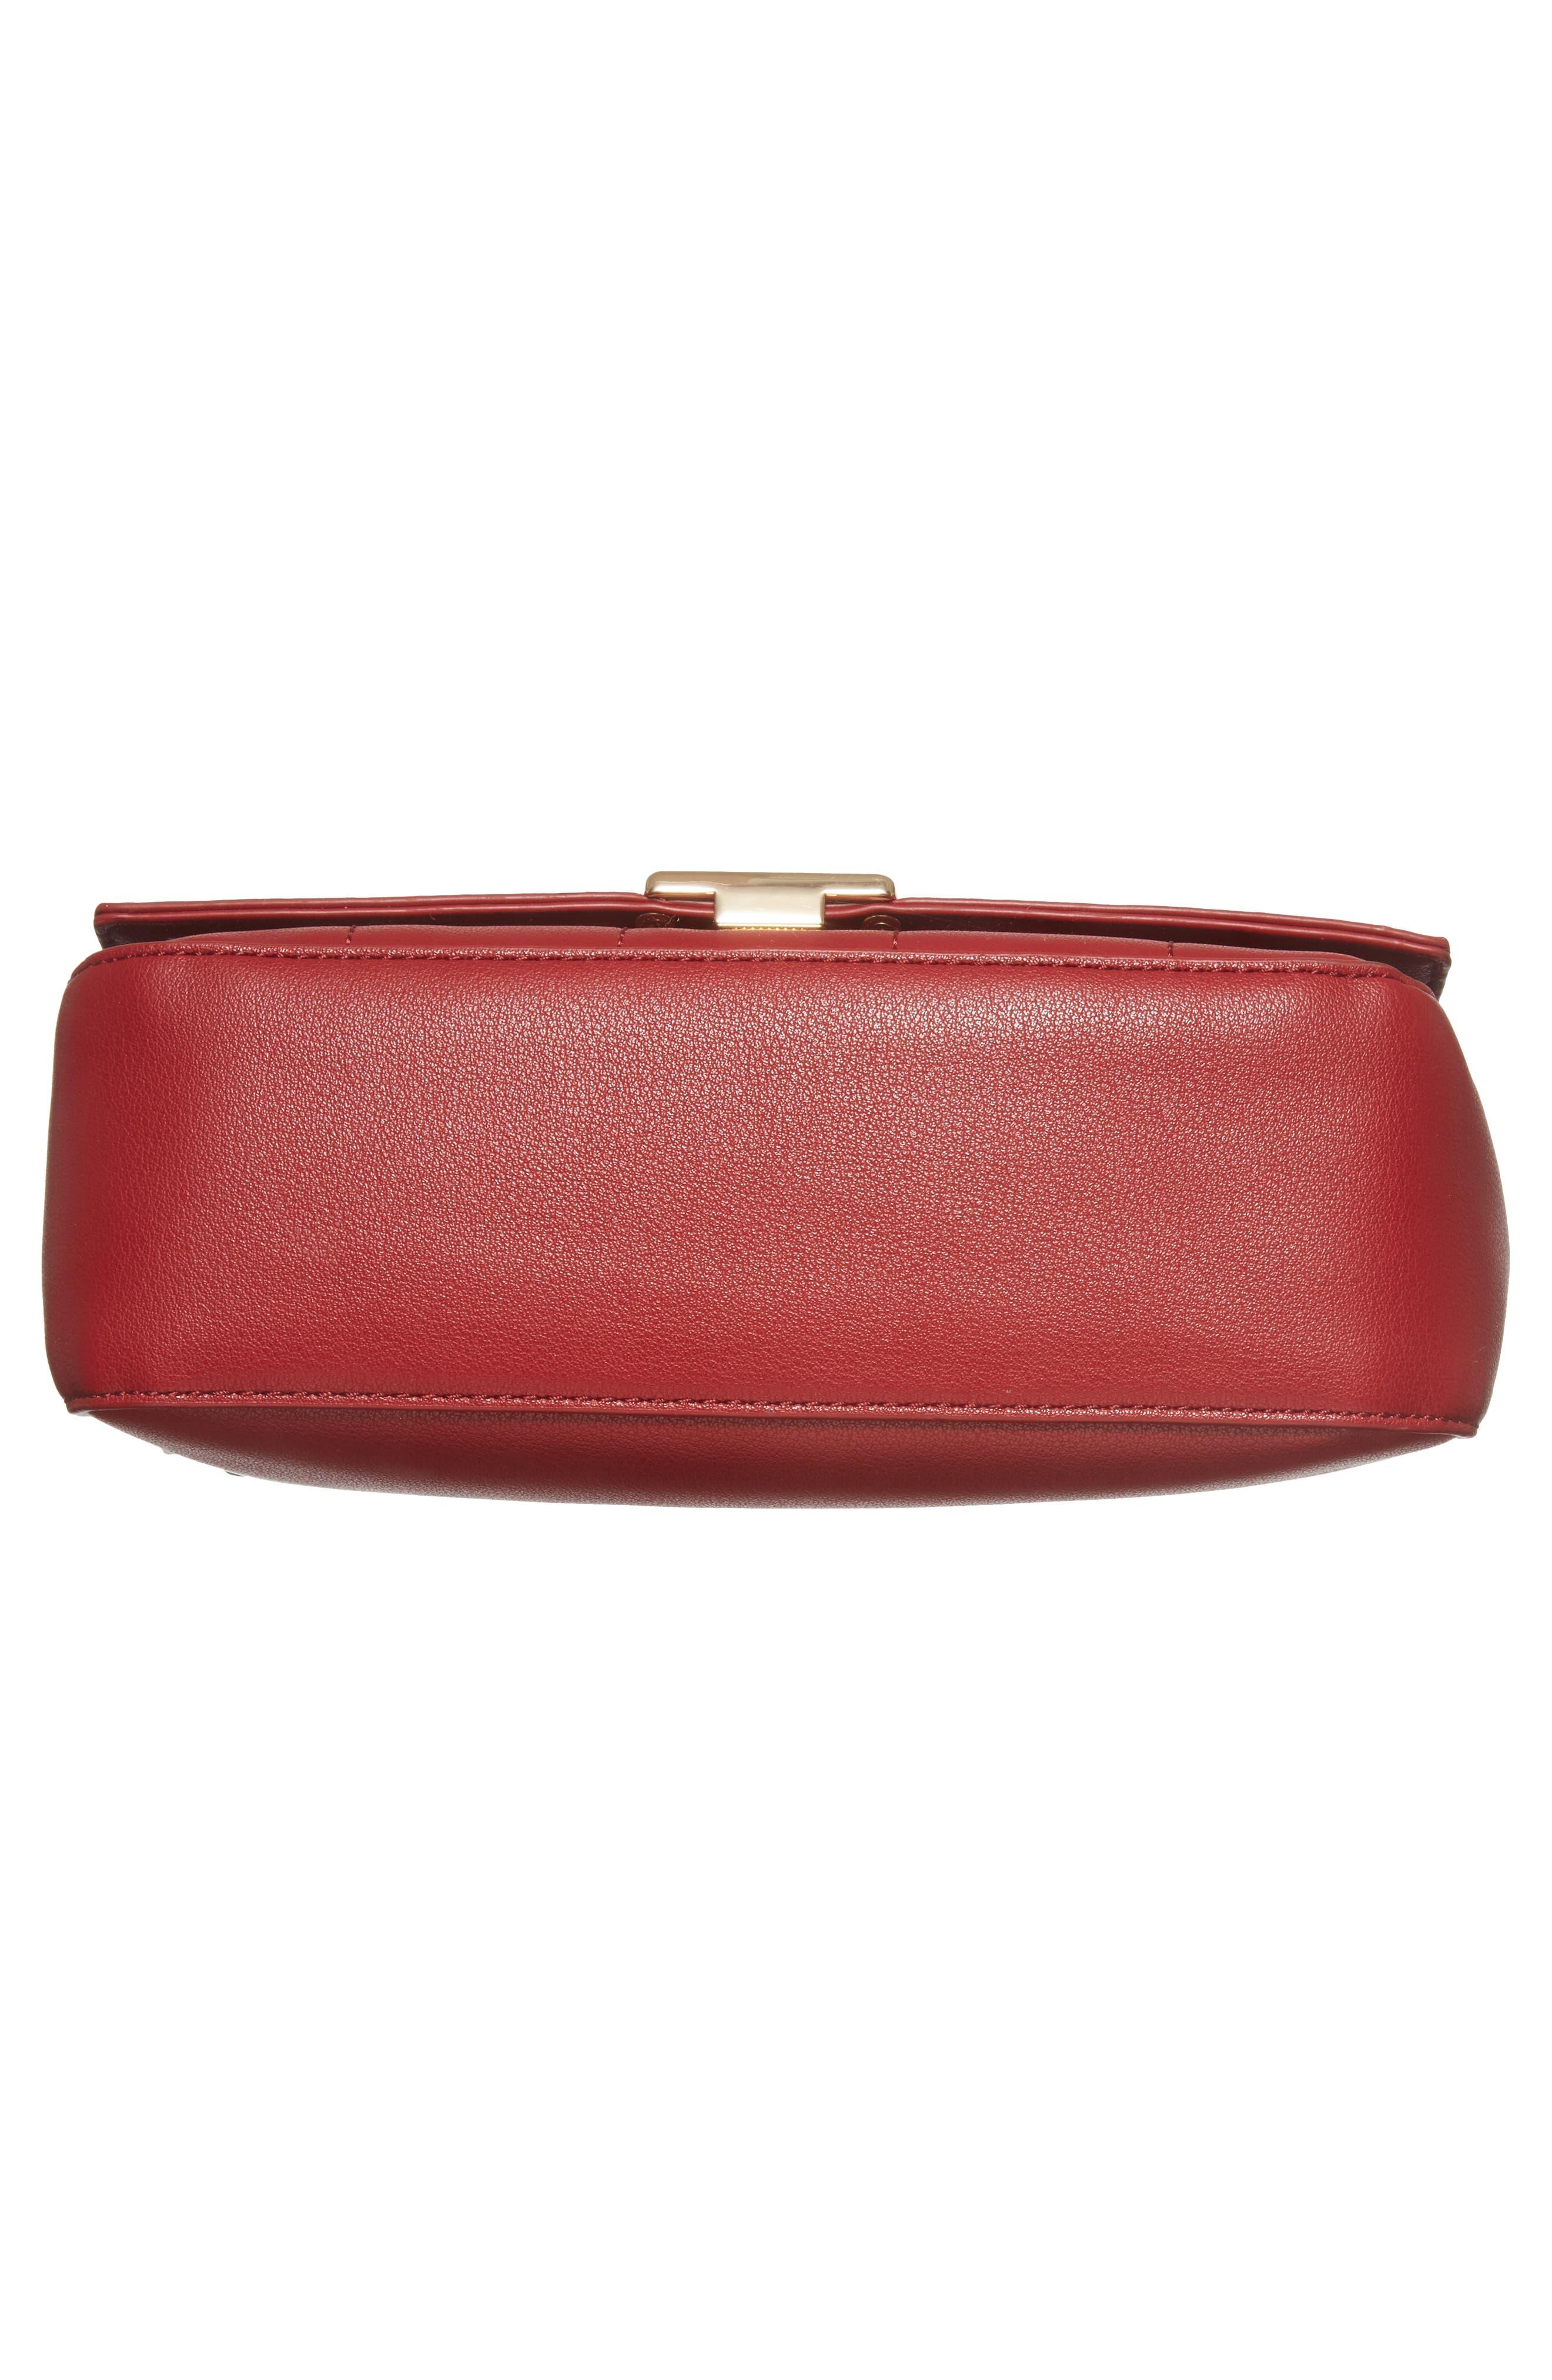 Colie Faux Leather Crossbody Bag,                             Alternate thumbnail 18, color,